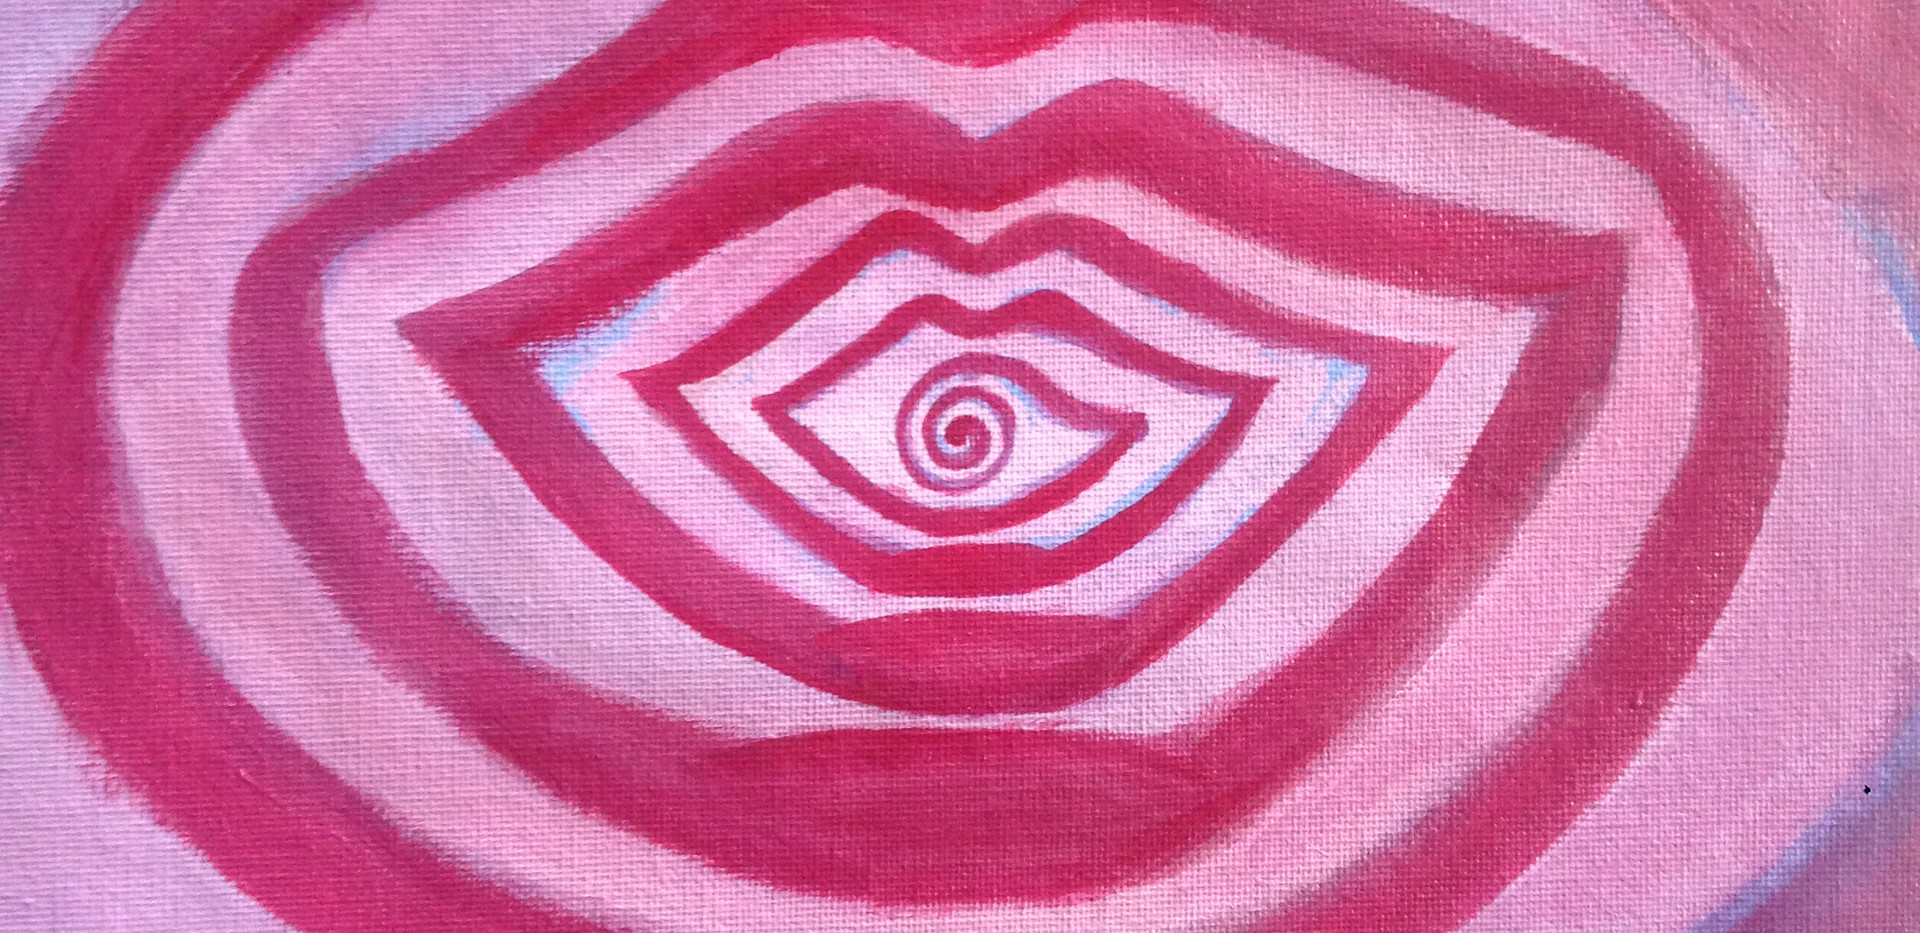 Adonai S'fatai - Feliza Painting